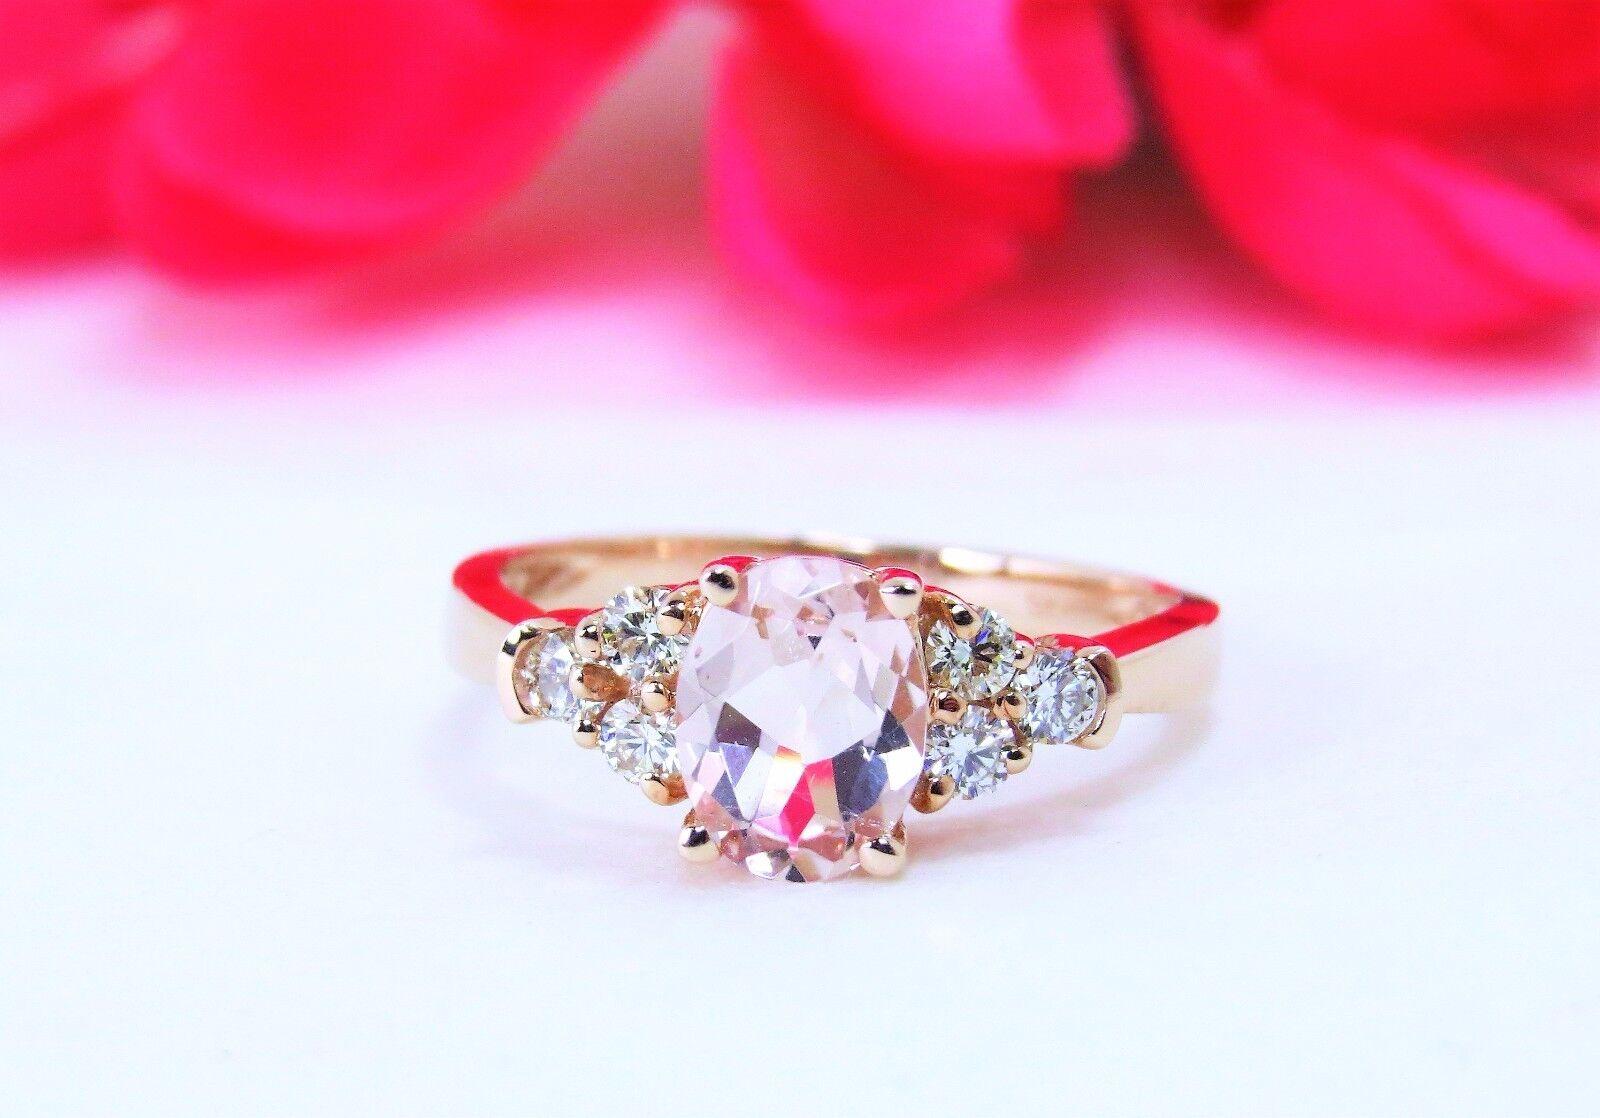 14k Rose Gold Oval Morganite W/ Diamond Accents Ring 7 | eBay